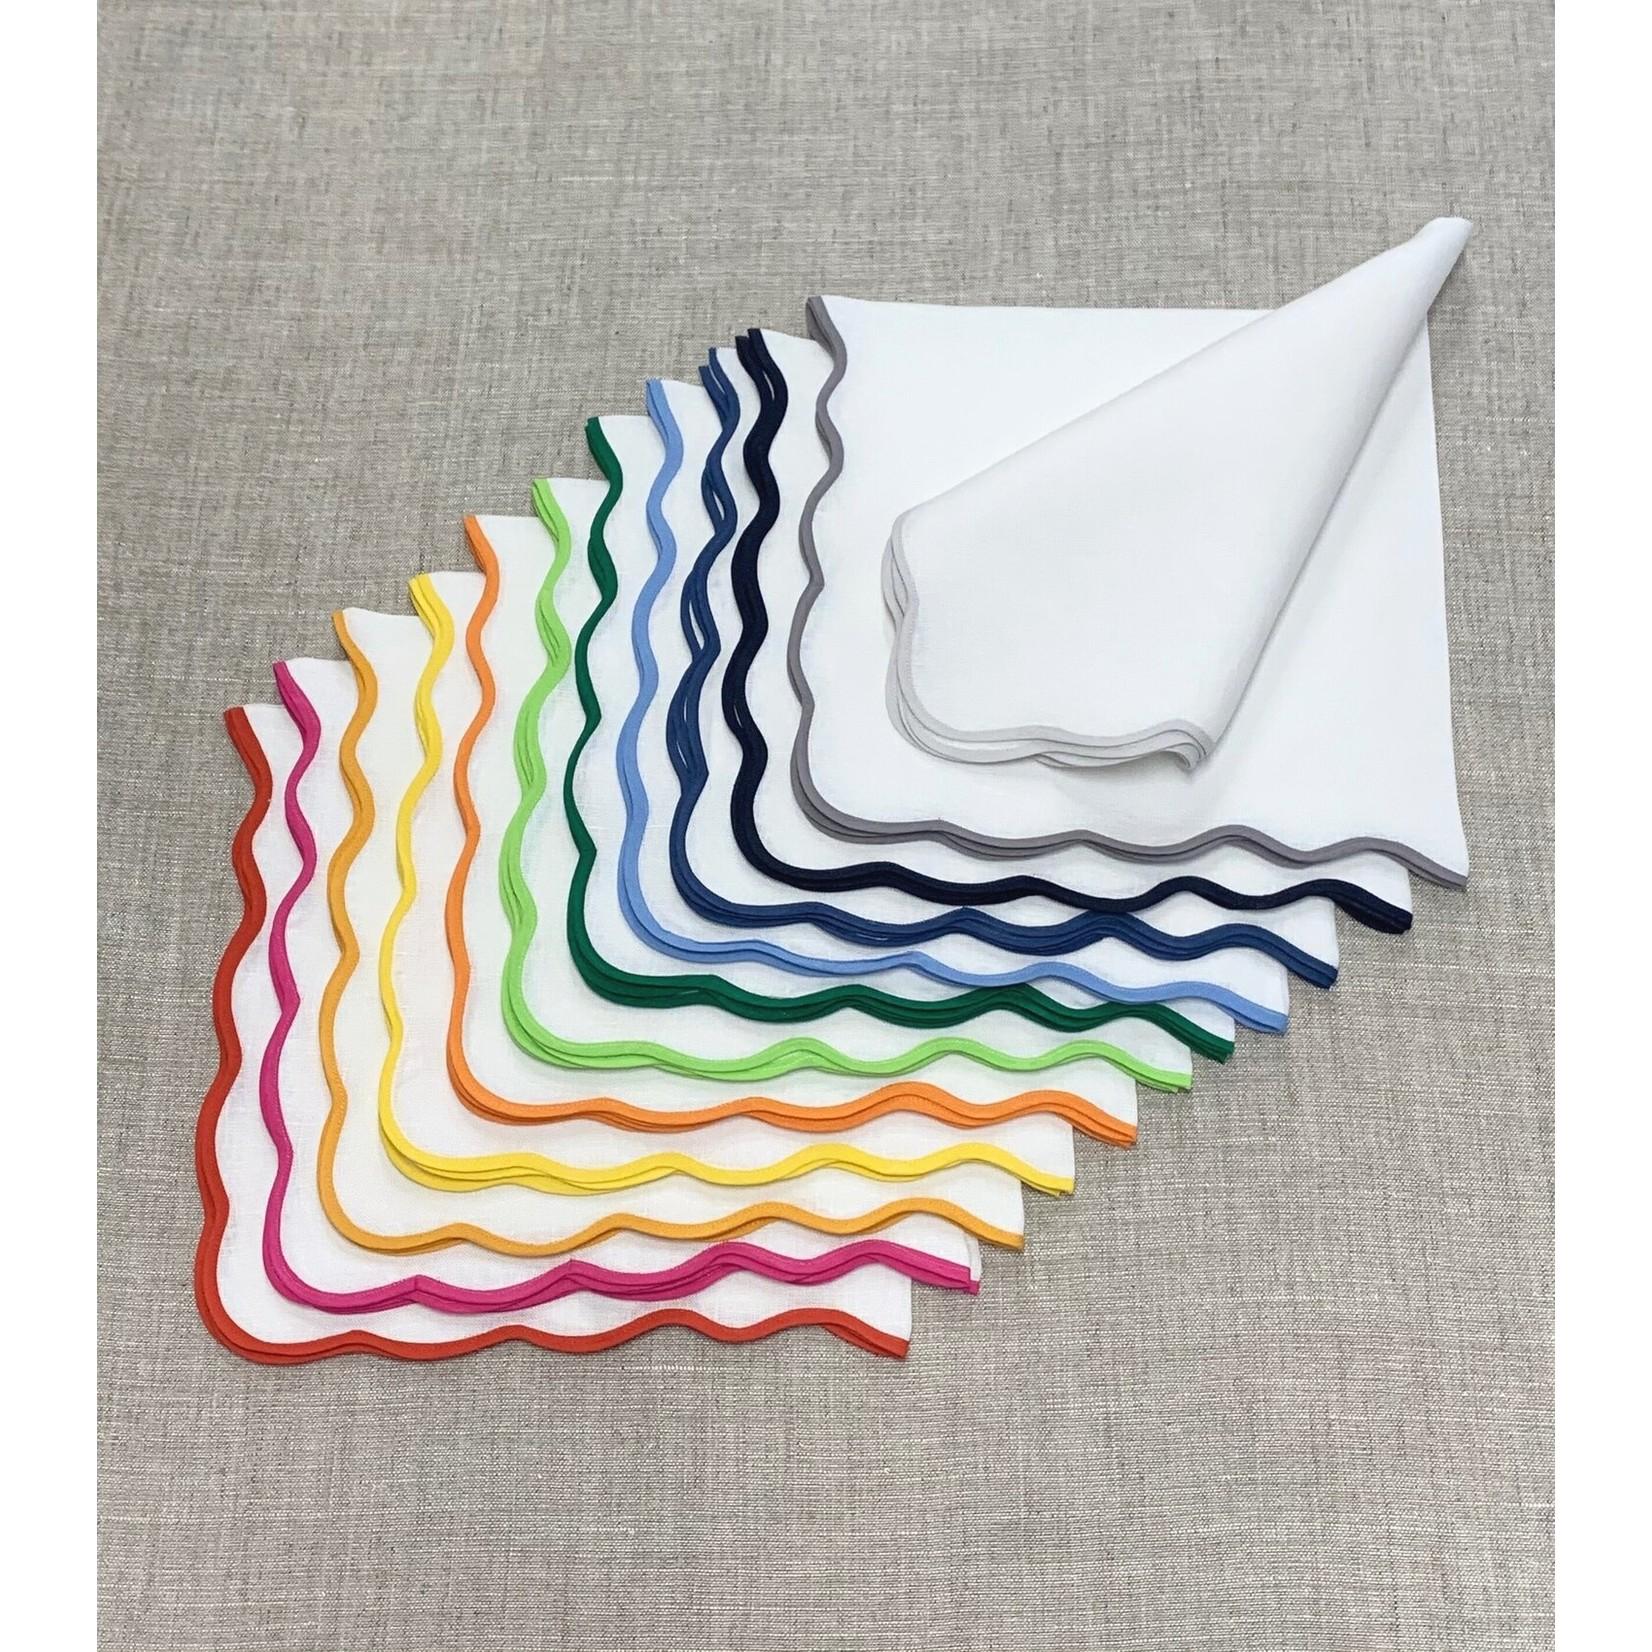 Tina Chen Designs Wave Border Napkins - Set of 6